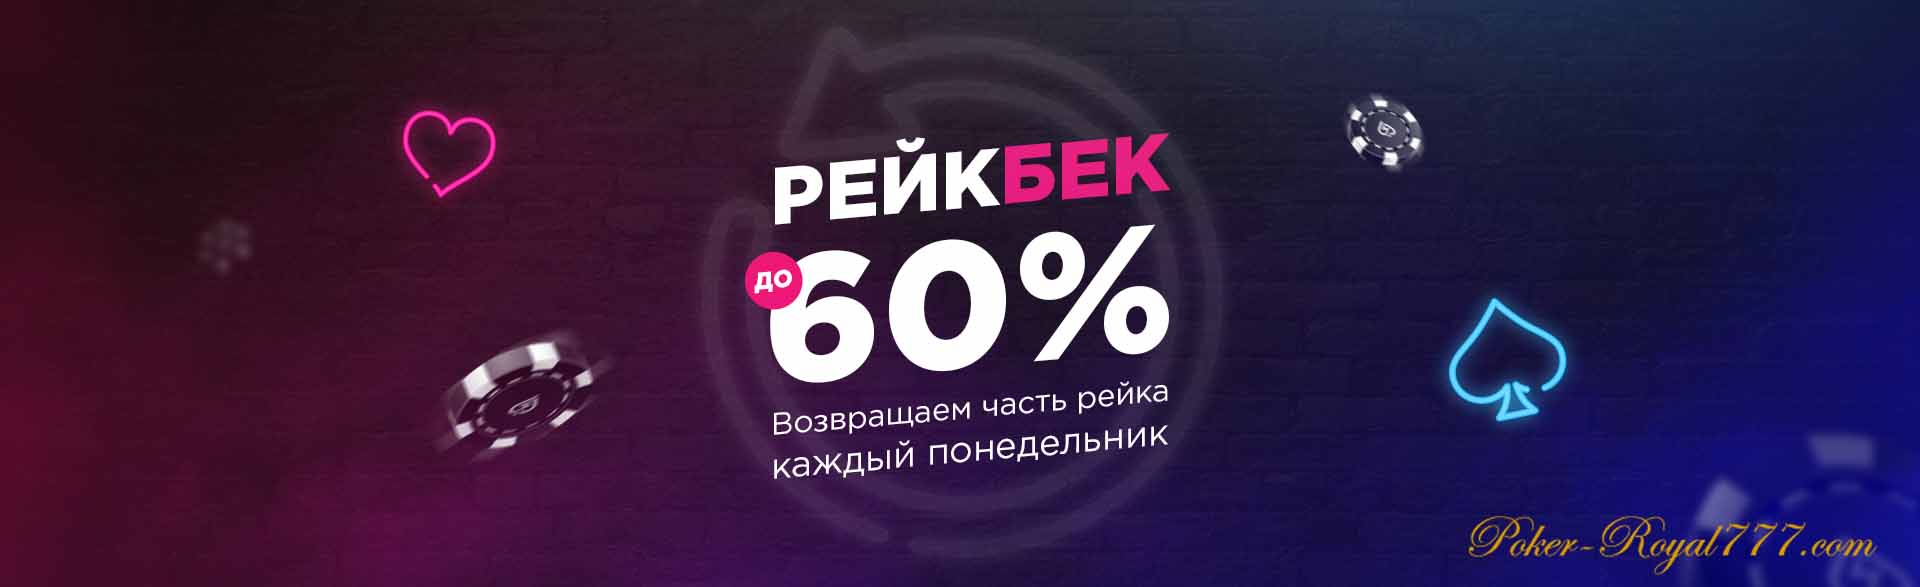 Grompoker рейкбек 60%